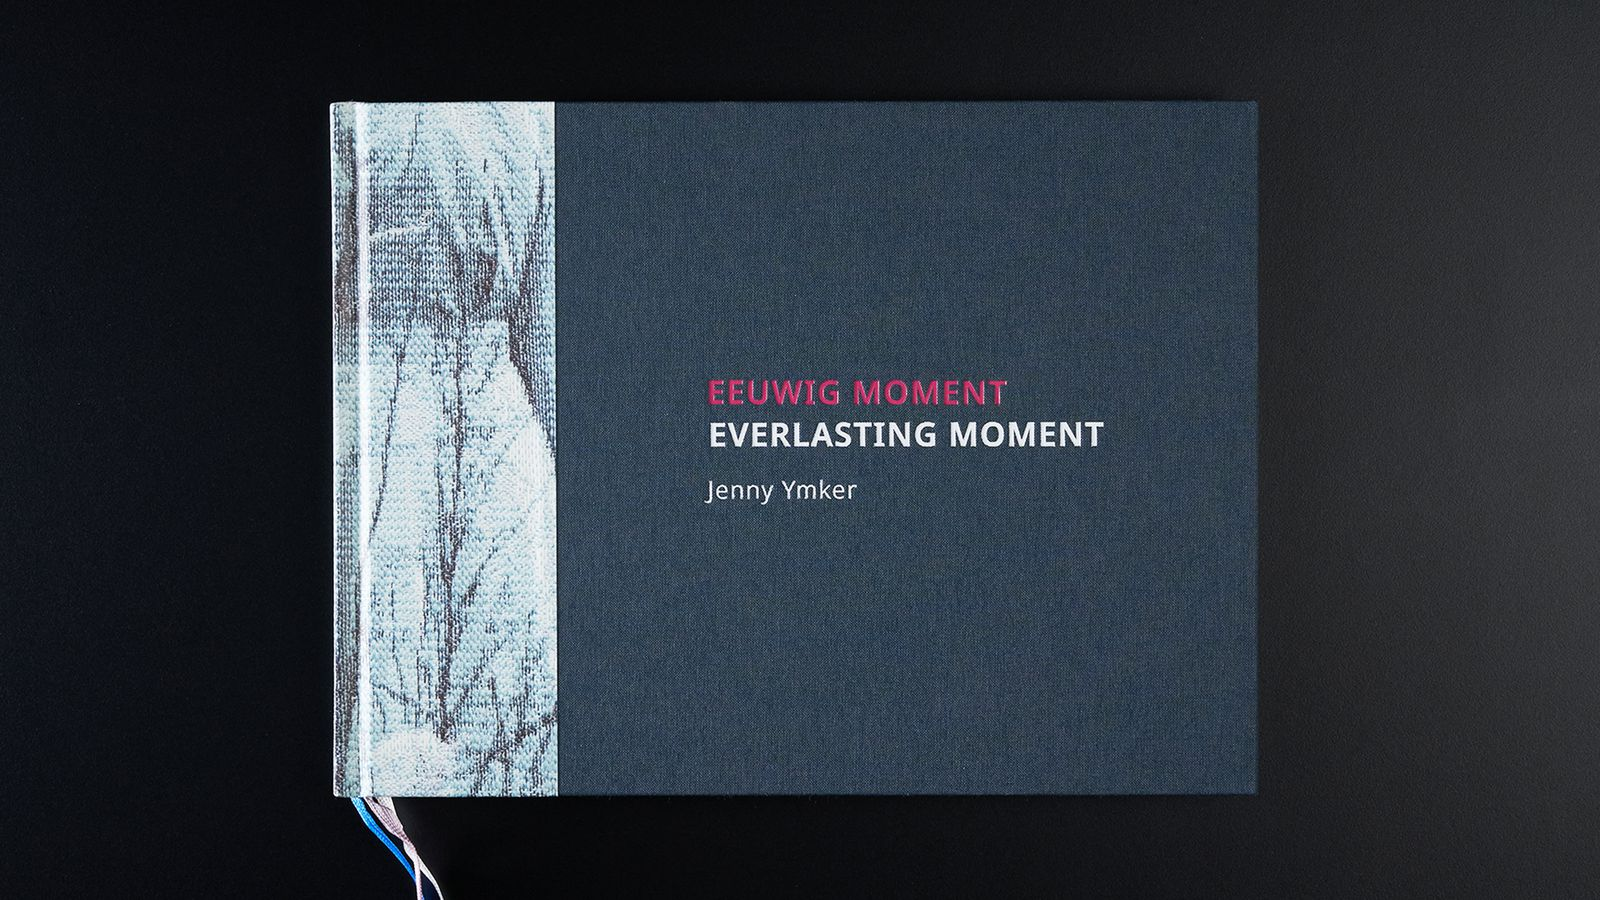 Eeuwig moment - Cover.jpg